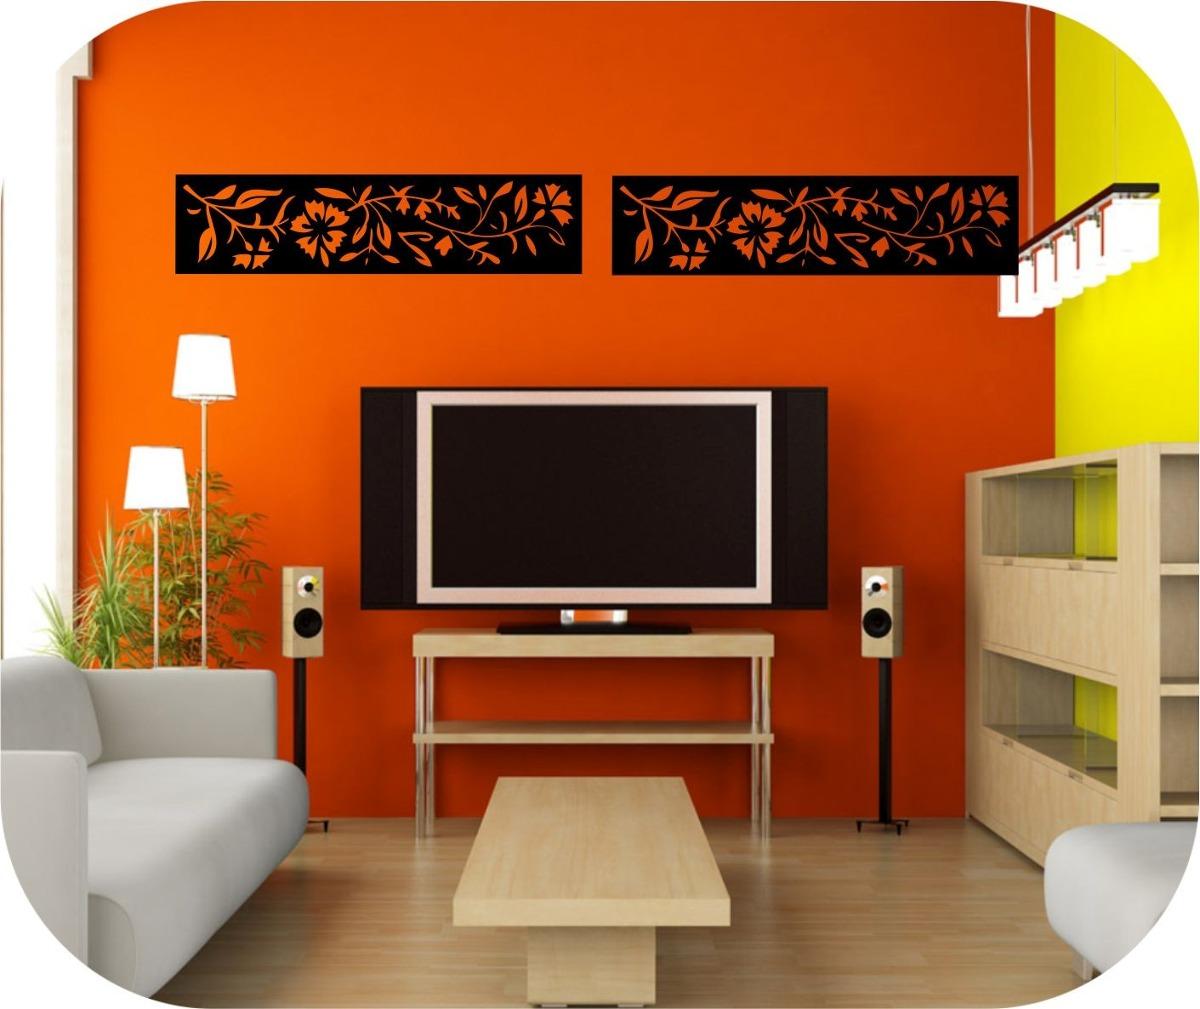 Vinilos decorativos para paredes cenefas cintas en vinilo - Frisos decorativos para paredes ...